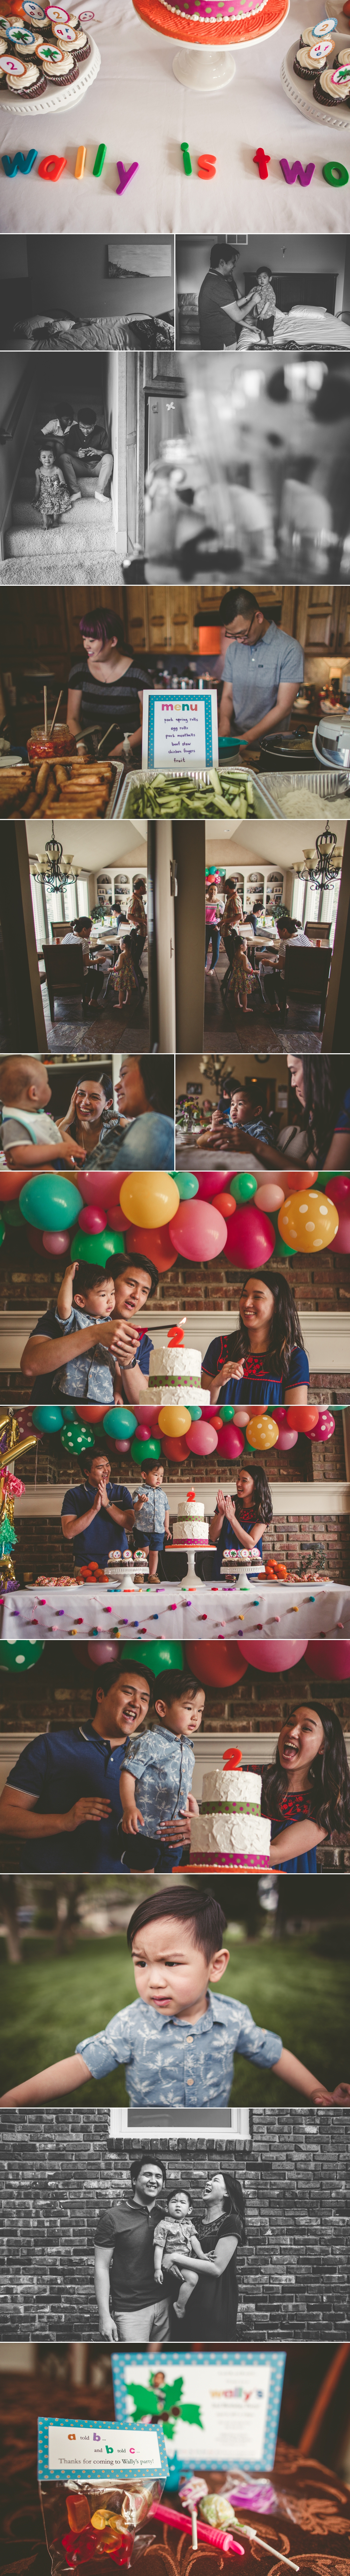 jason_domingues_photography_best_kansas_city_photographer_family_photos_birthday_party_lifestyle_photography_kc.jpg